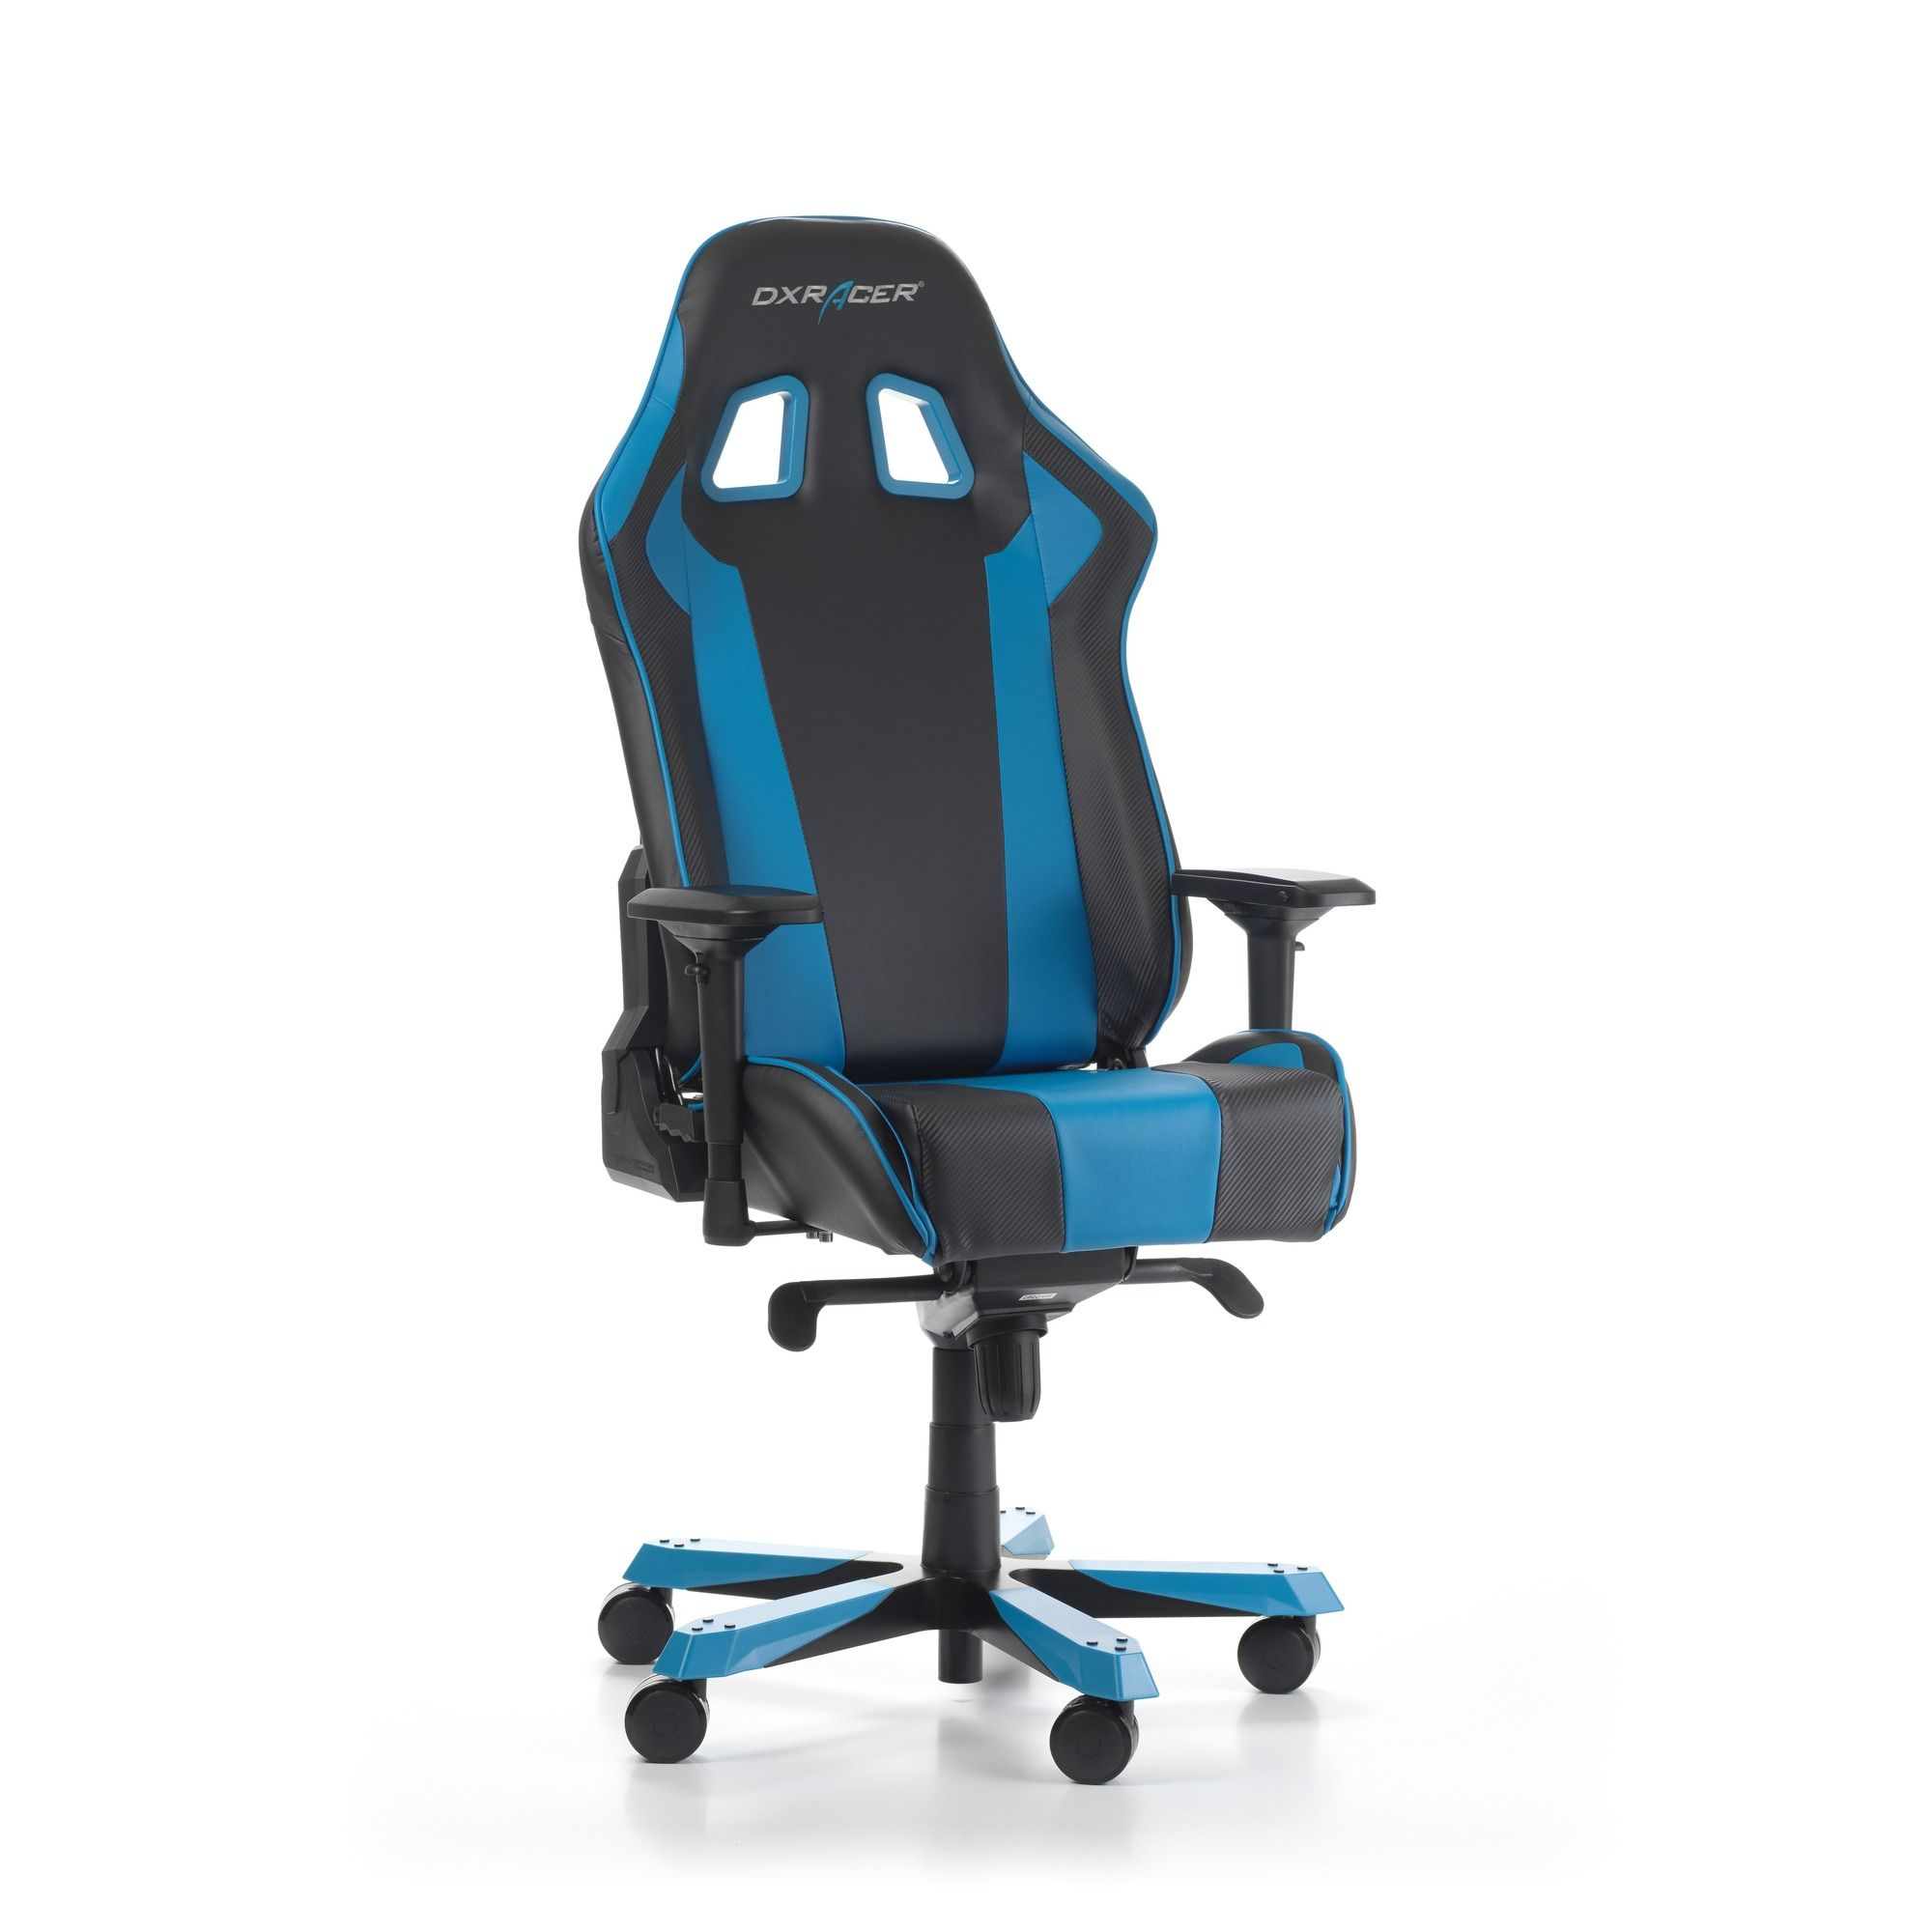 Геймърски стол DXRacer - серия KING, черен/син - OH/KS06/NB - 8